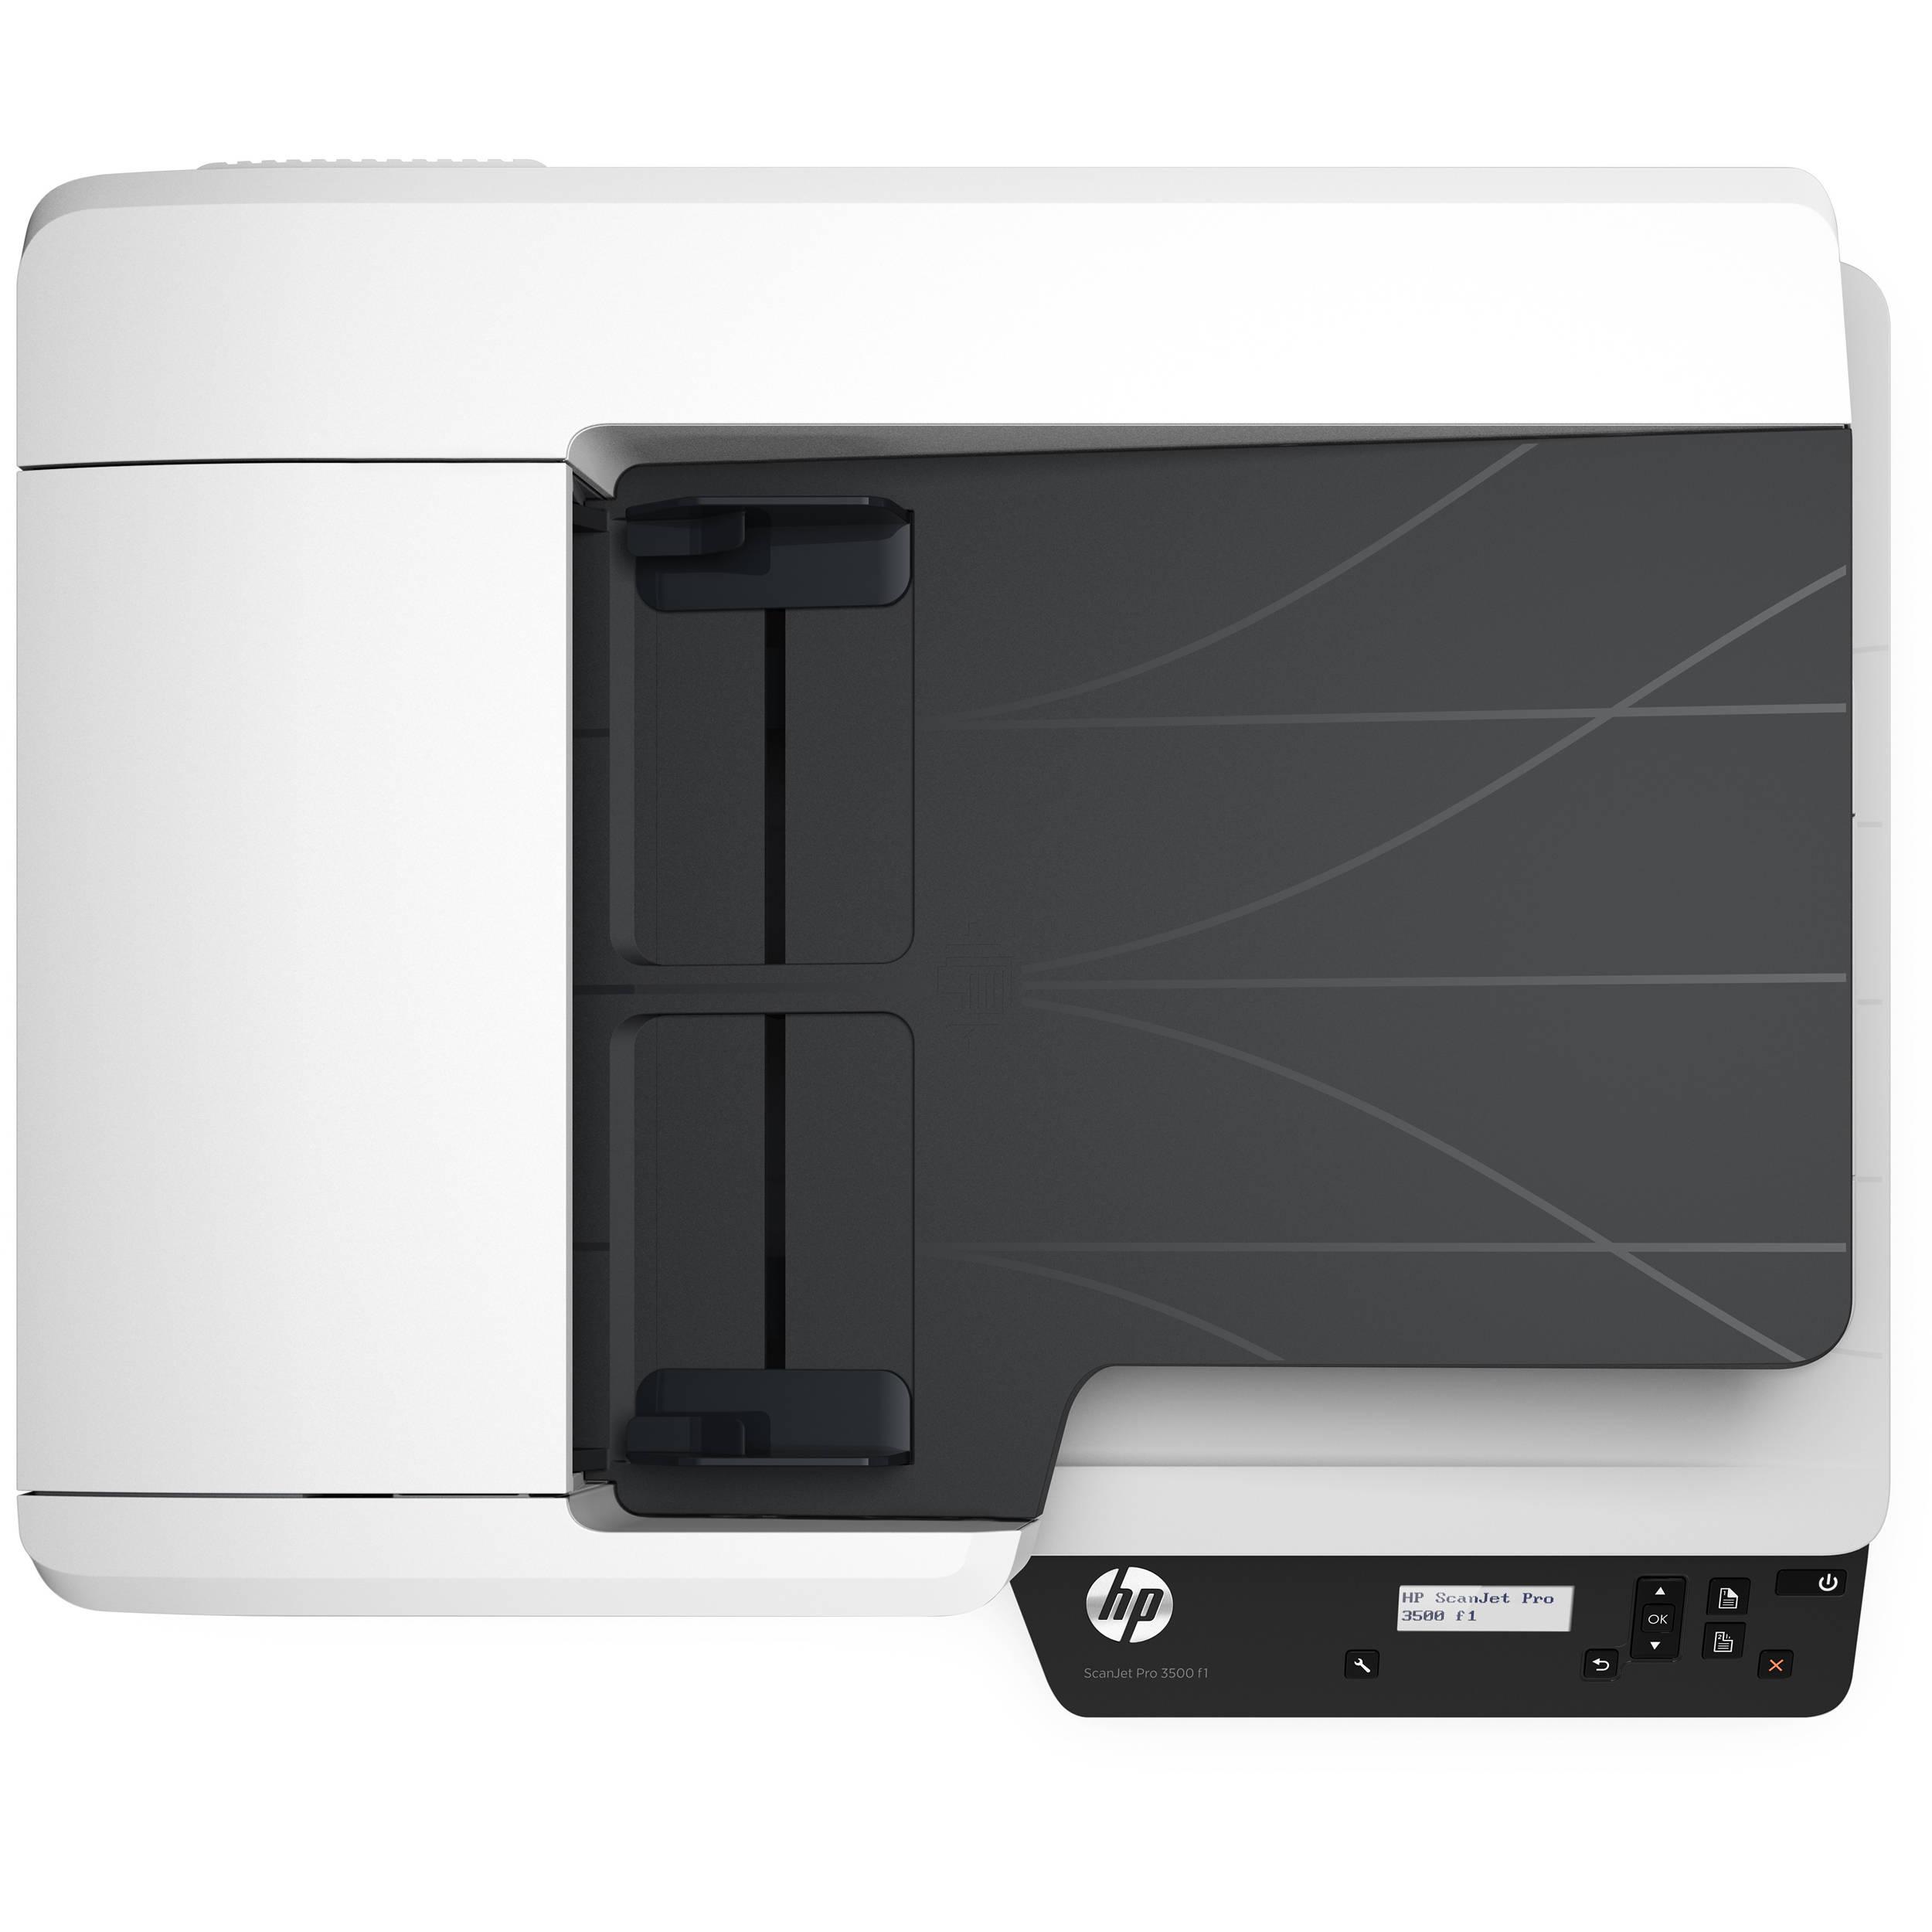 HP Scanjet Pro 3500 f1 Document Scanner